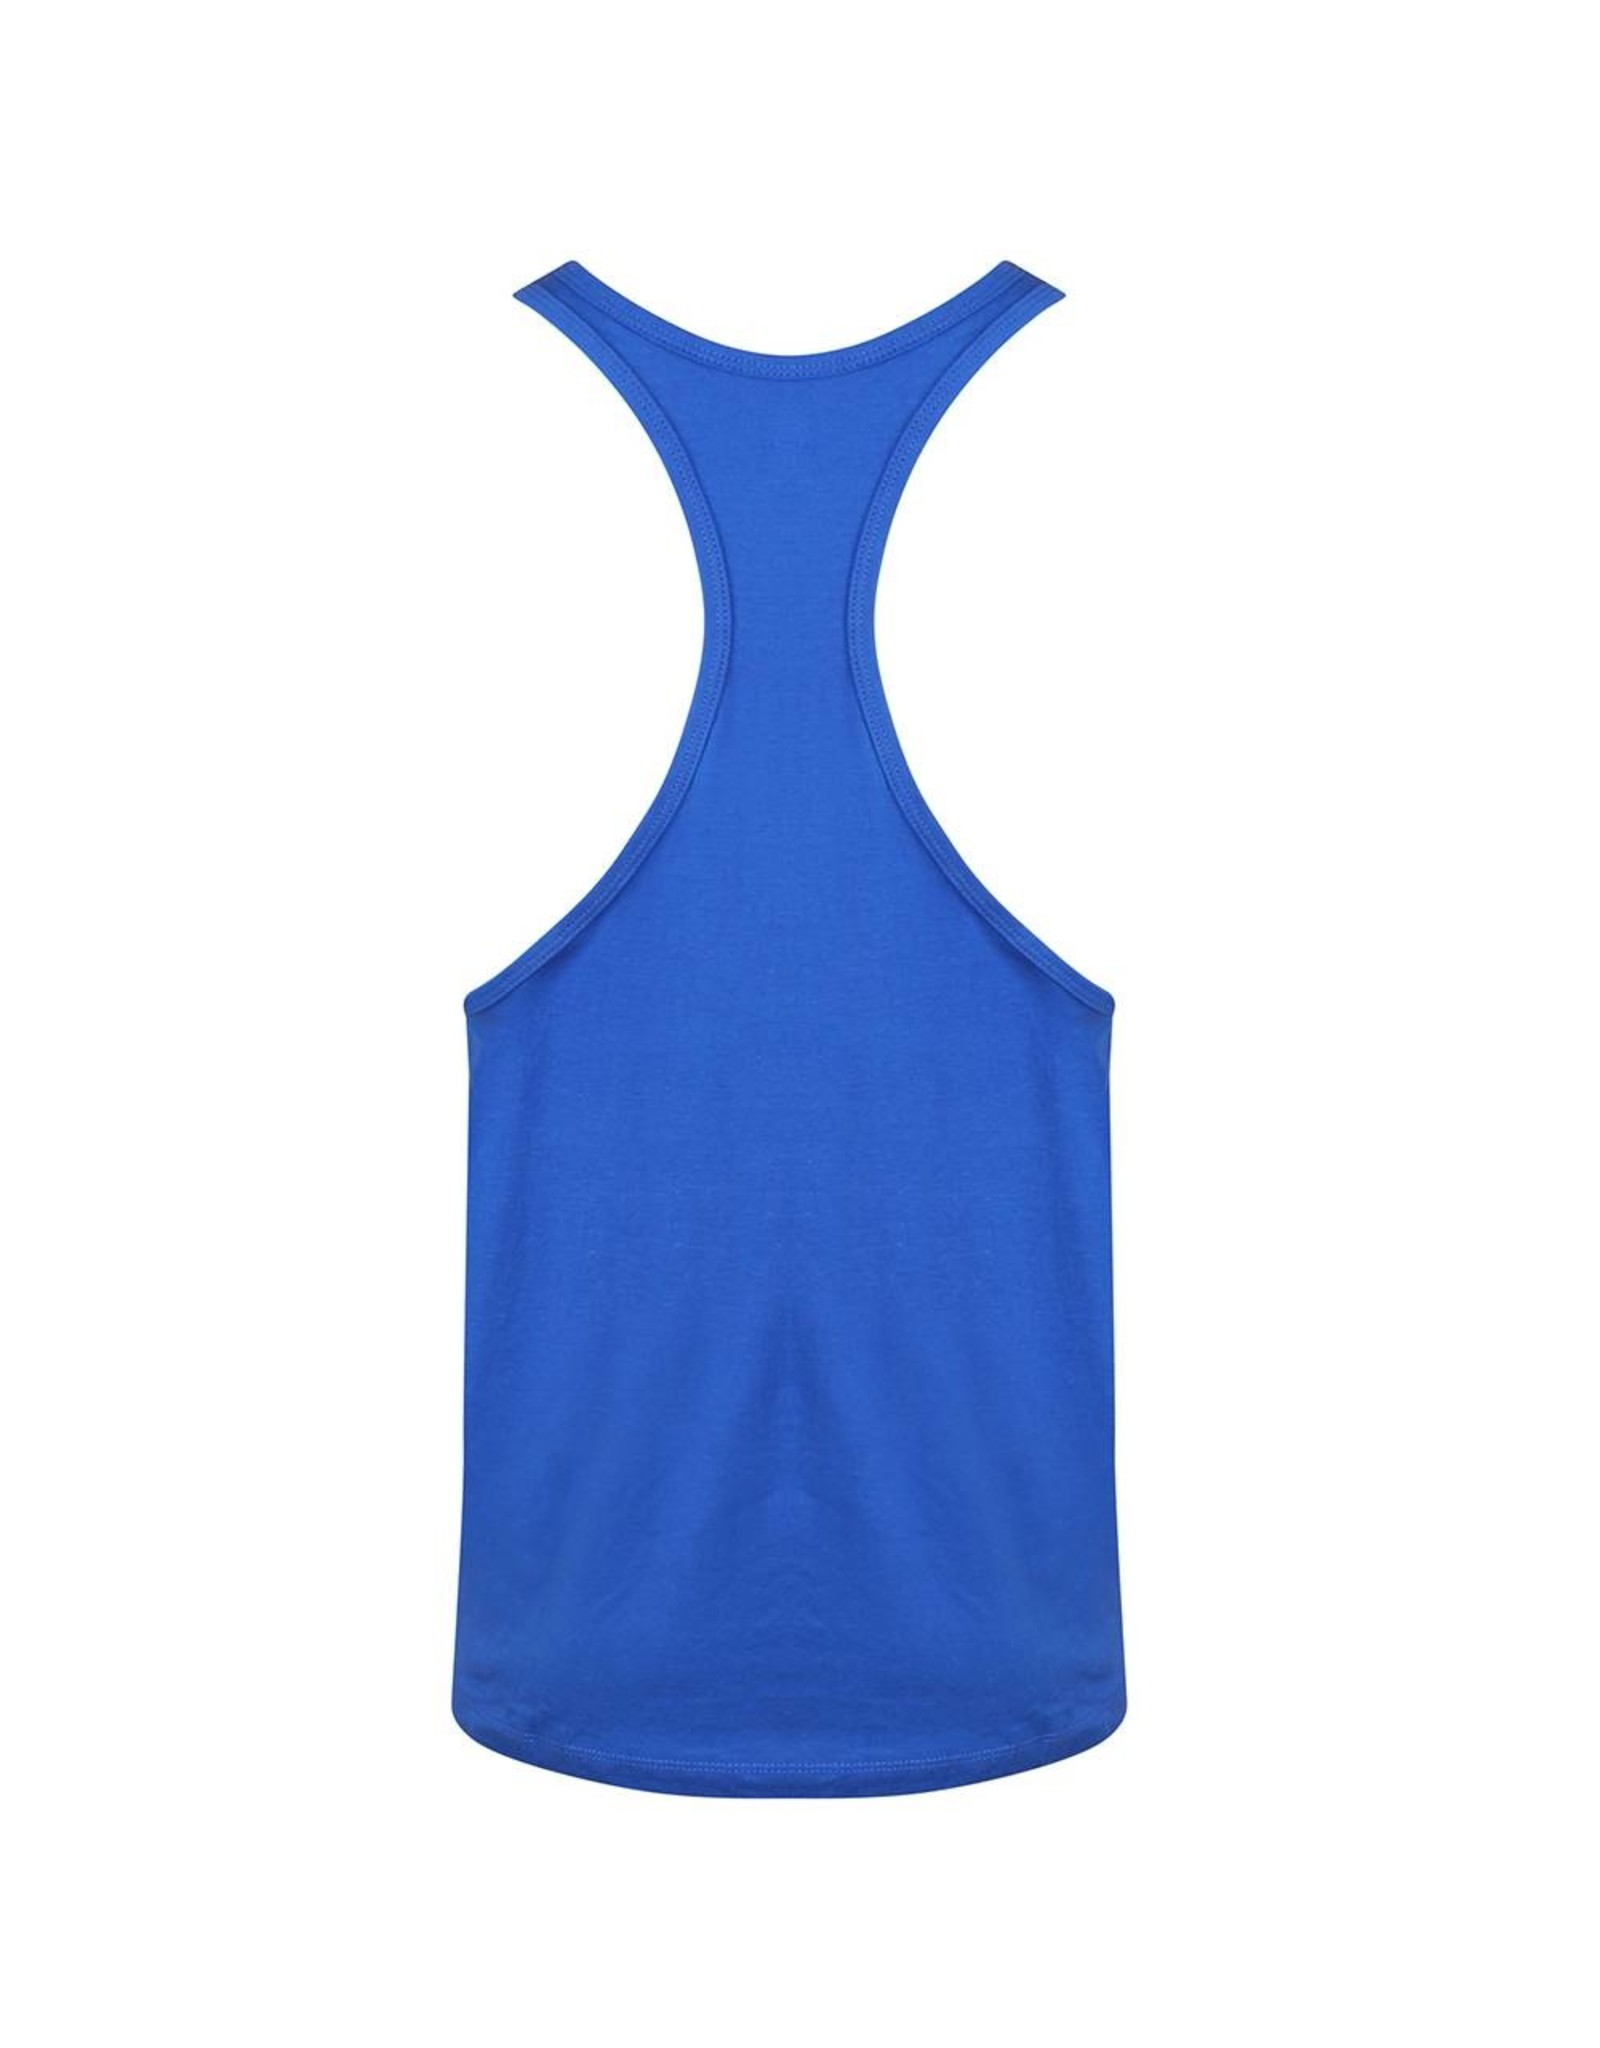 Gold's Gym Muscle Joe Premium String Vest - Royal